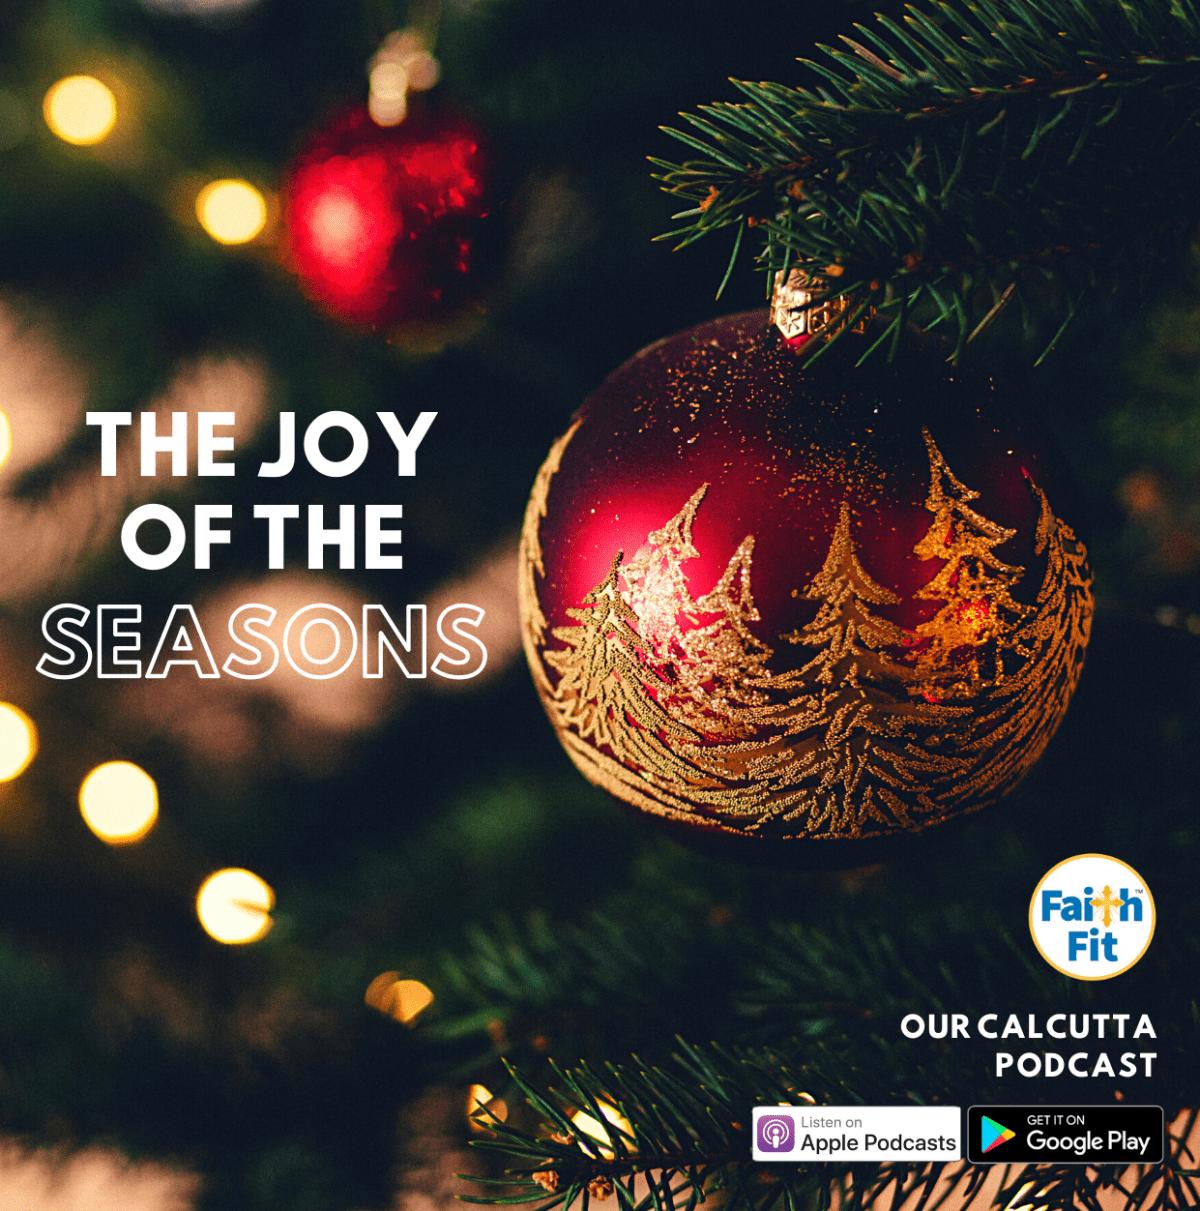 #7: The Joy of the Seasons